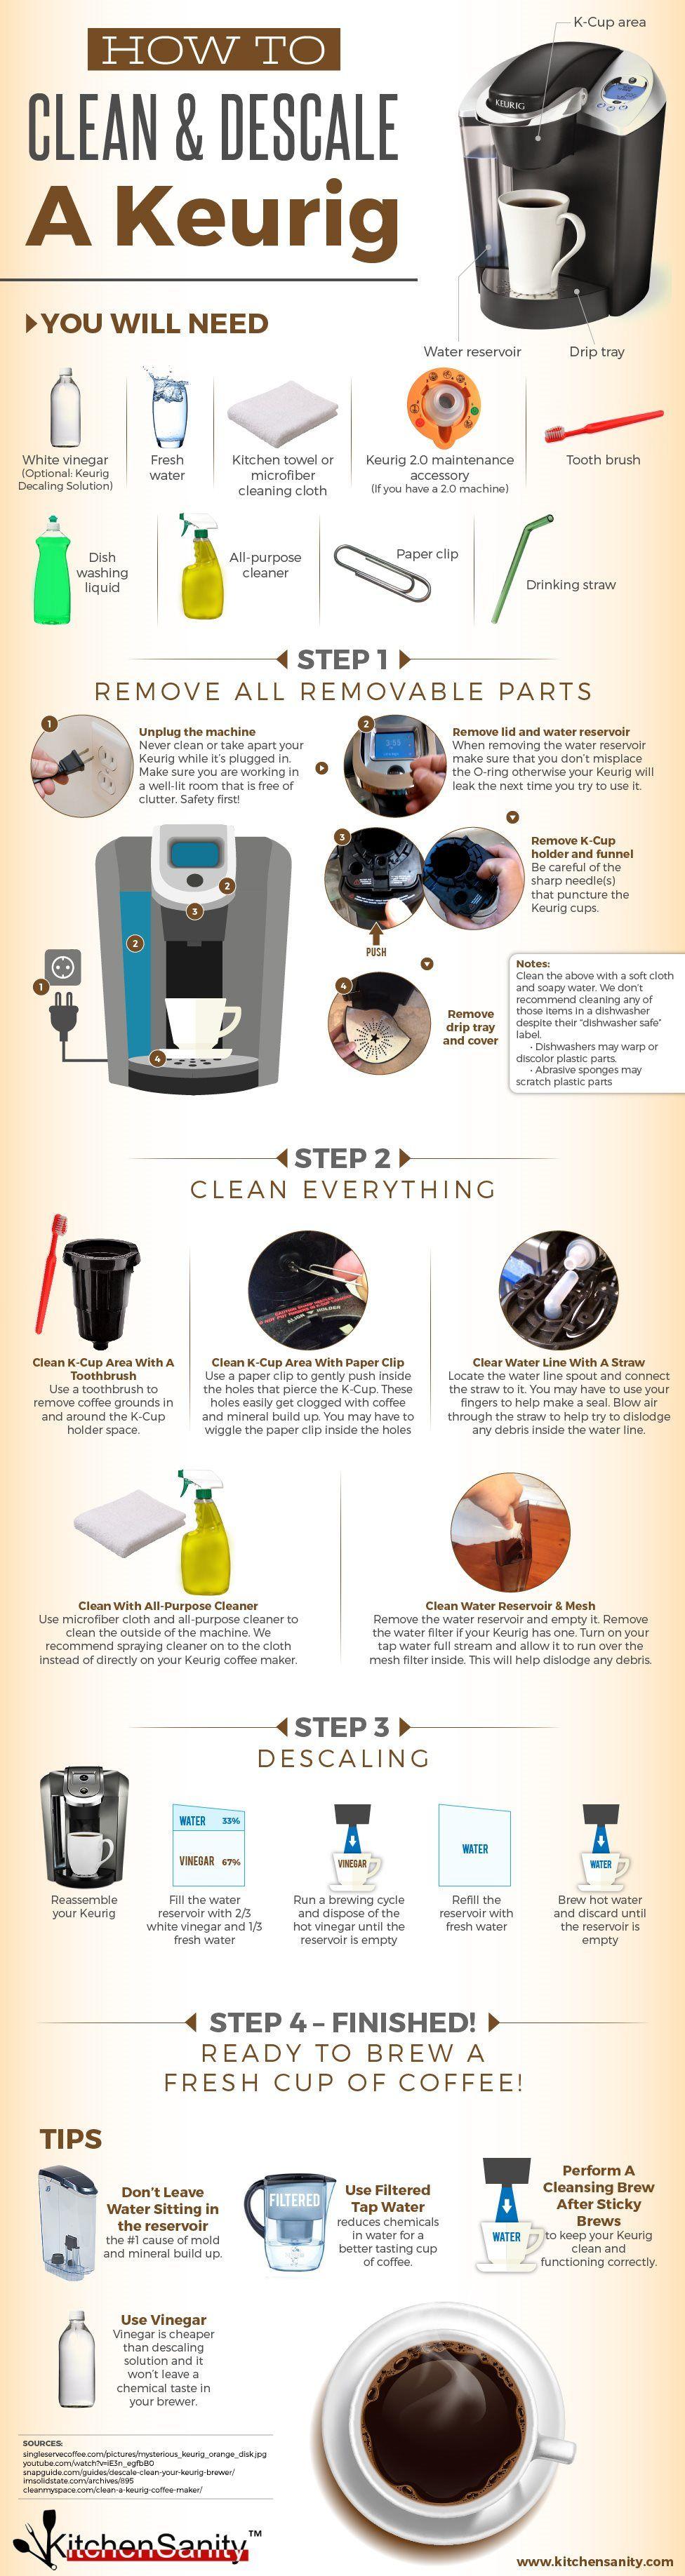 How To Clean Descale A Keurig Coffee Maker Keurig Cleaning